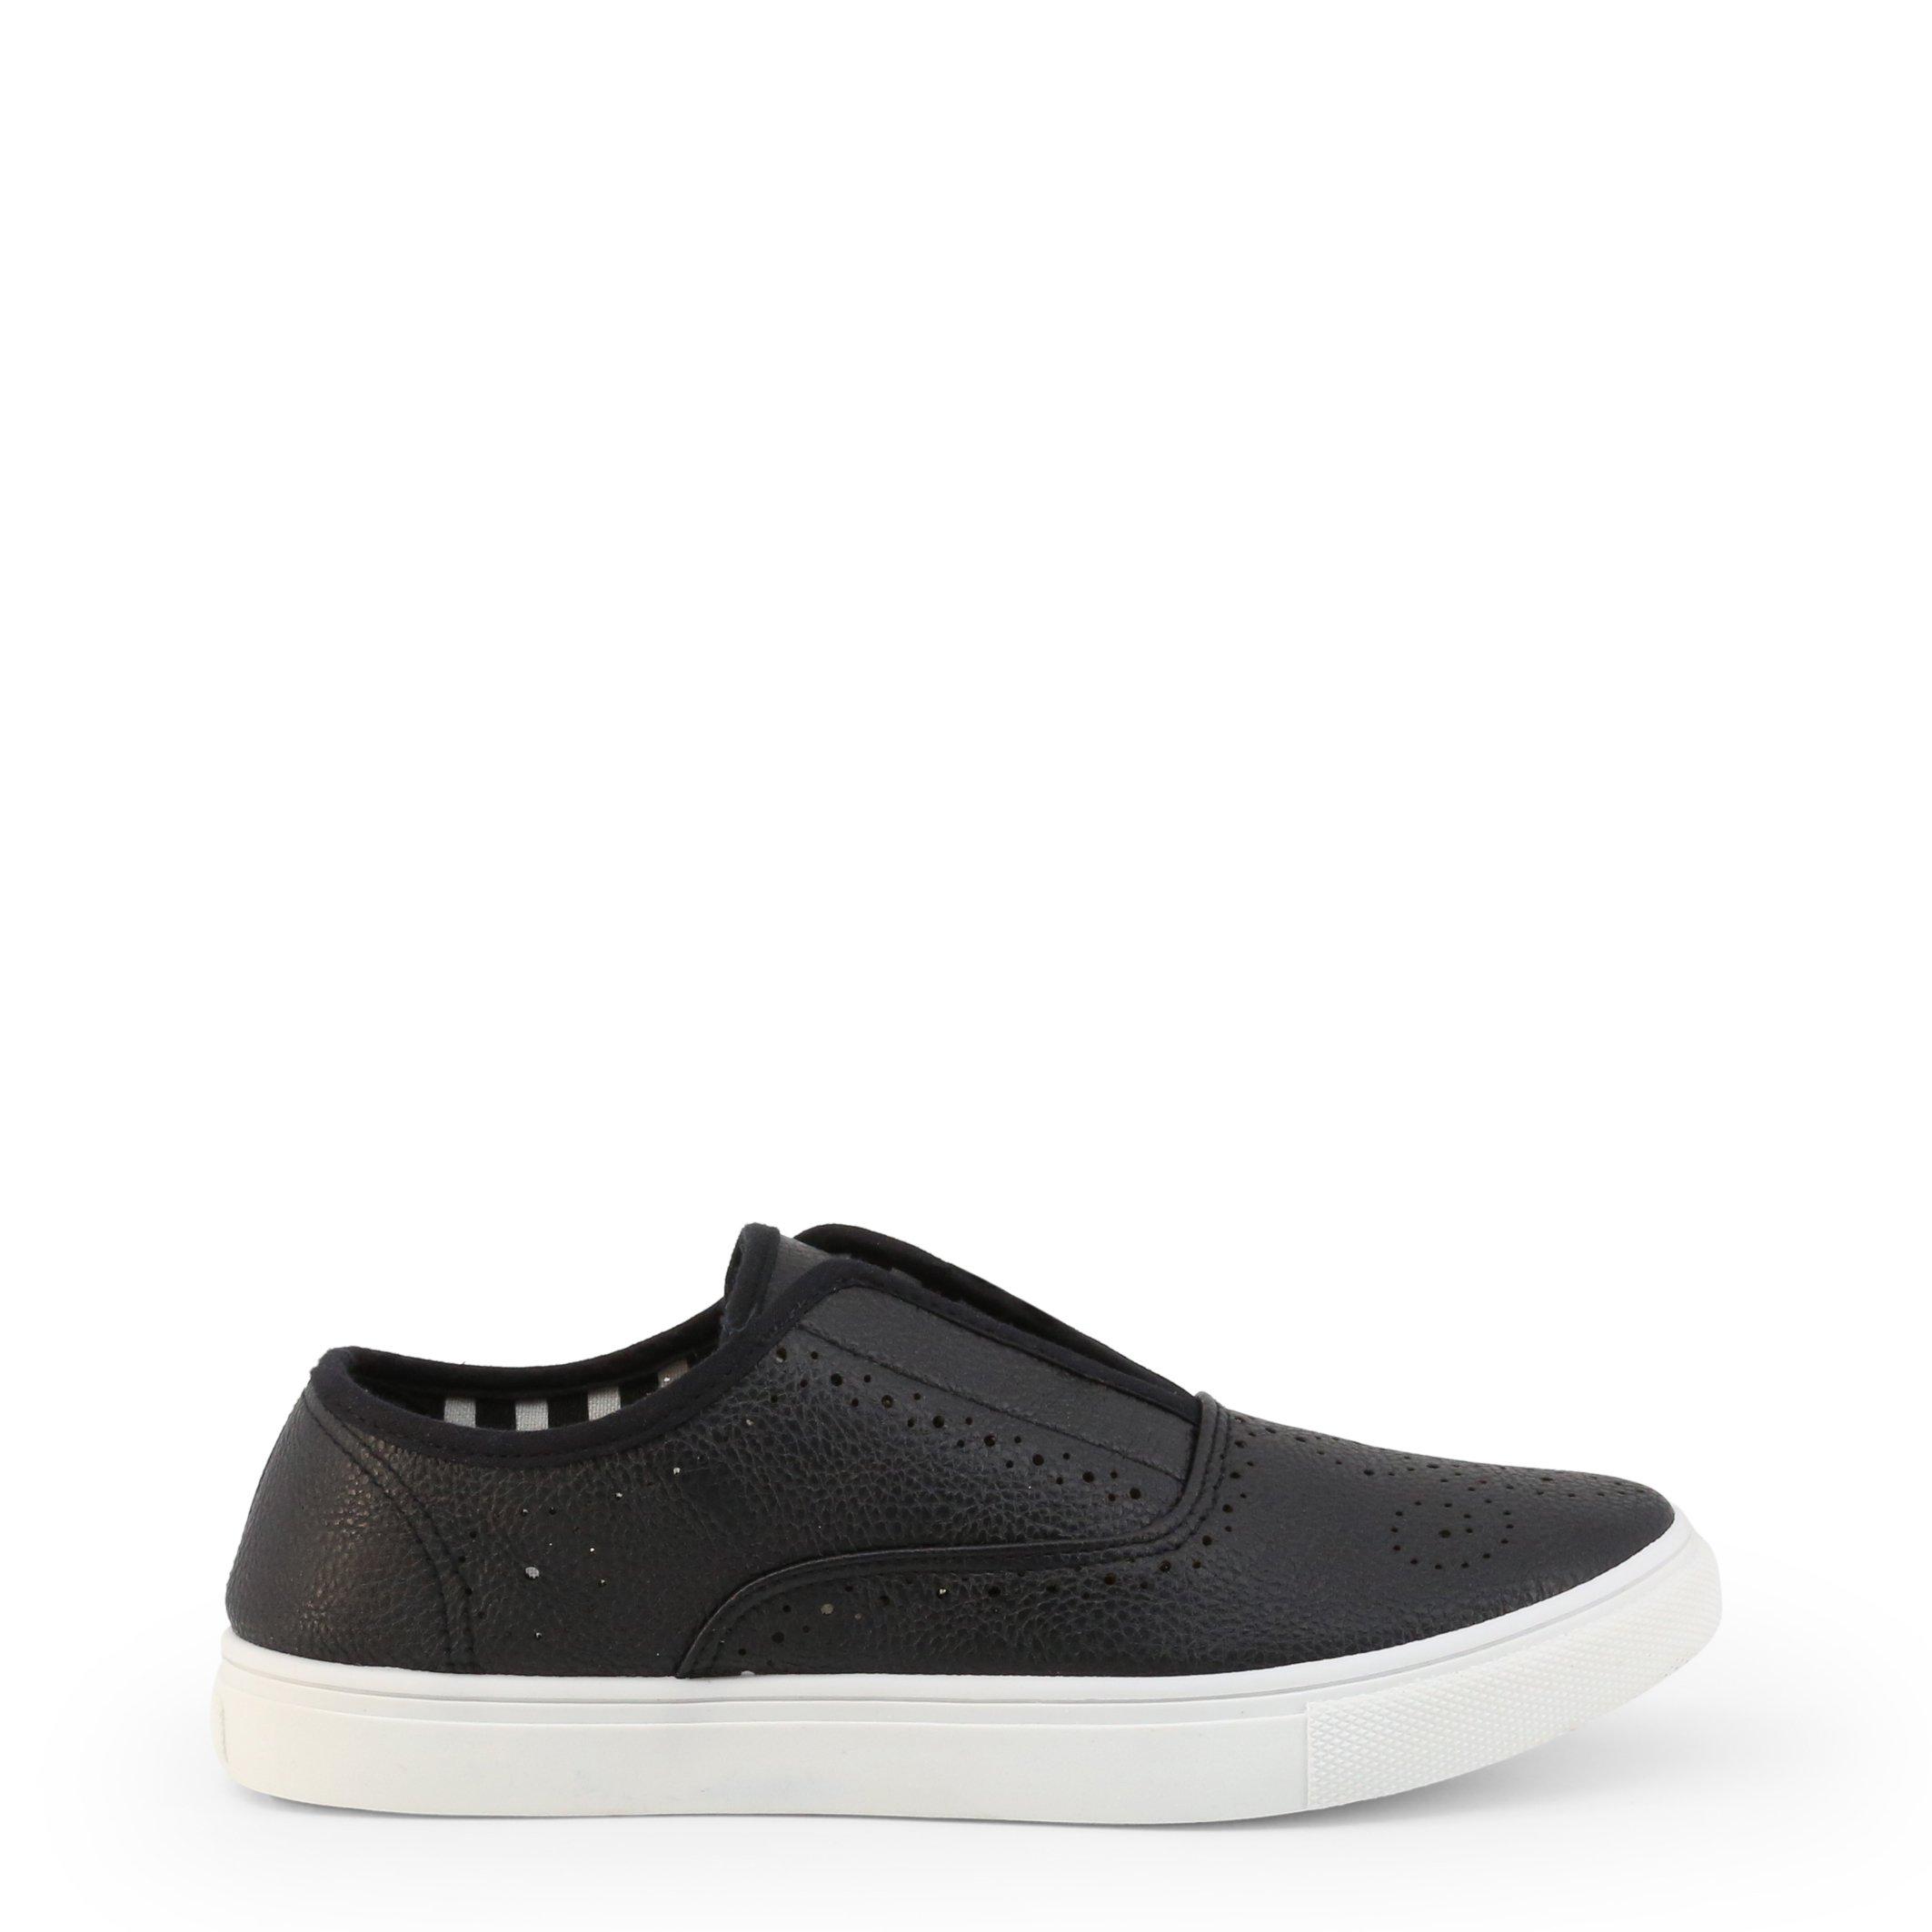 Roccobarocco Women's Slip On Shoe Various Colours RBSC1C701 - black EU 36